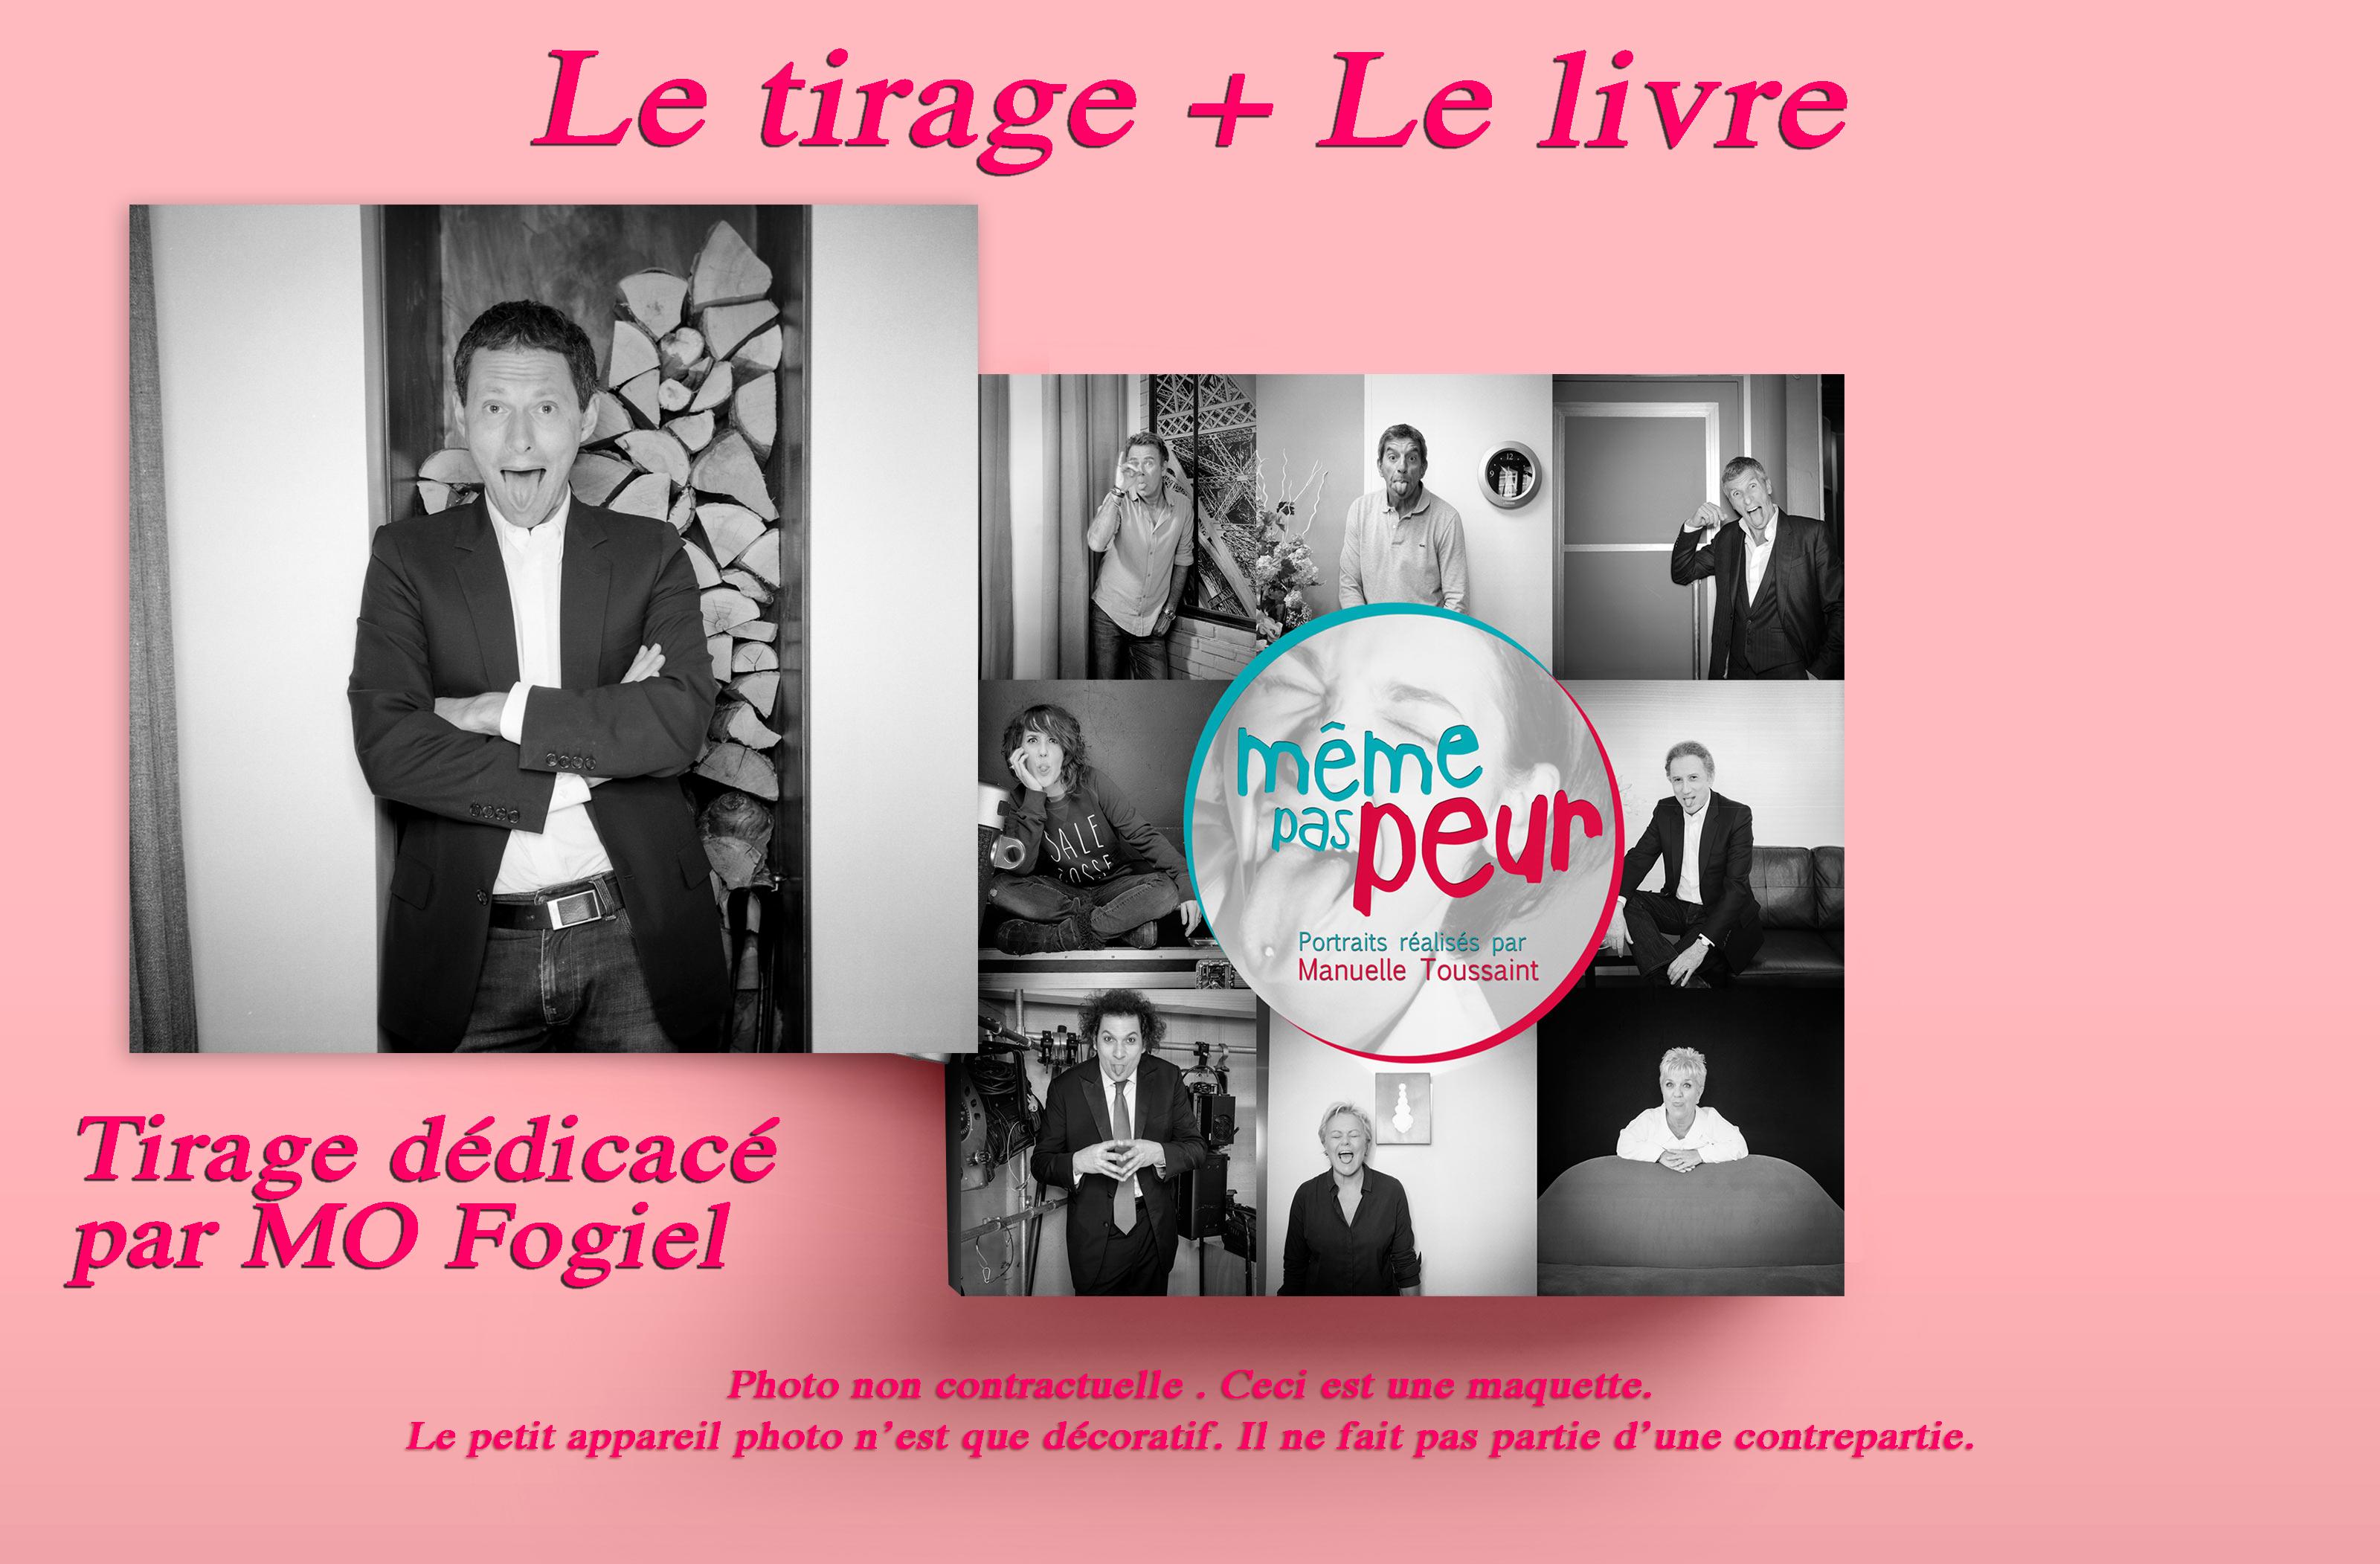 Tirage_Dedicace_Fogiel_livre-1497101668.jpg